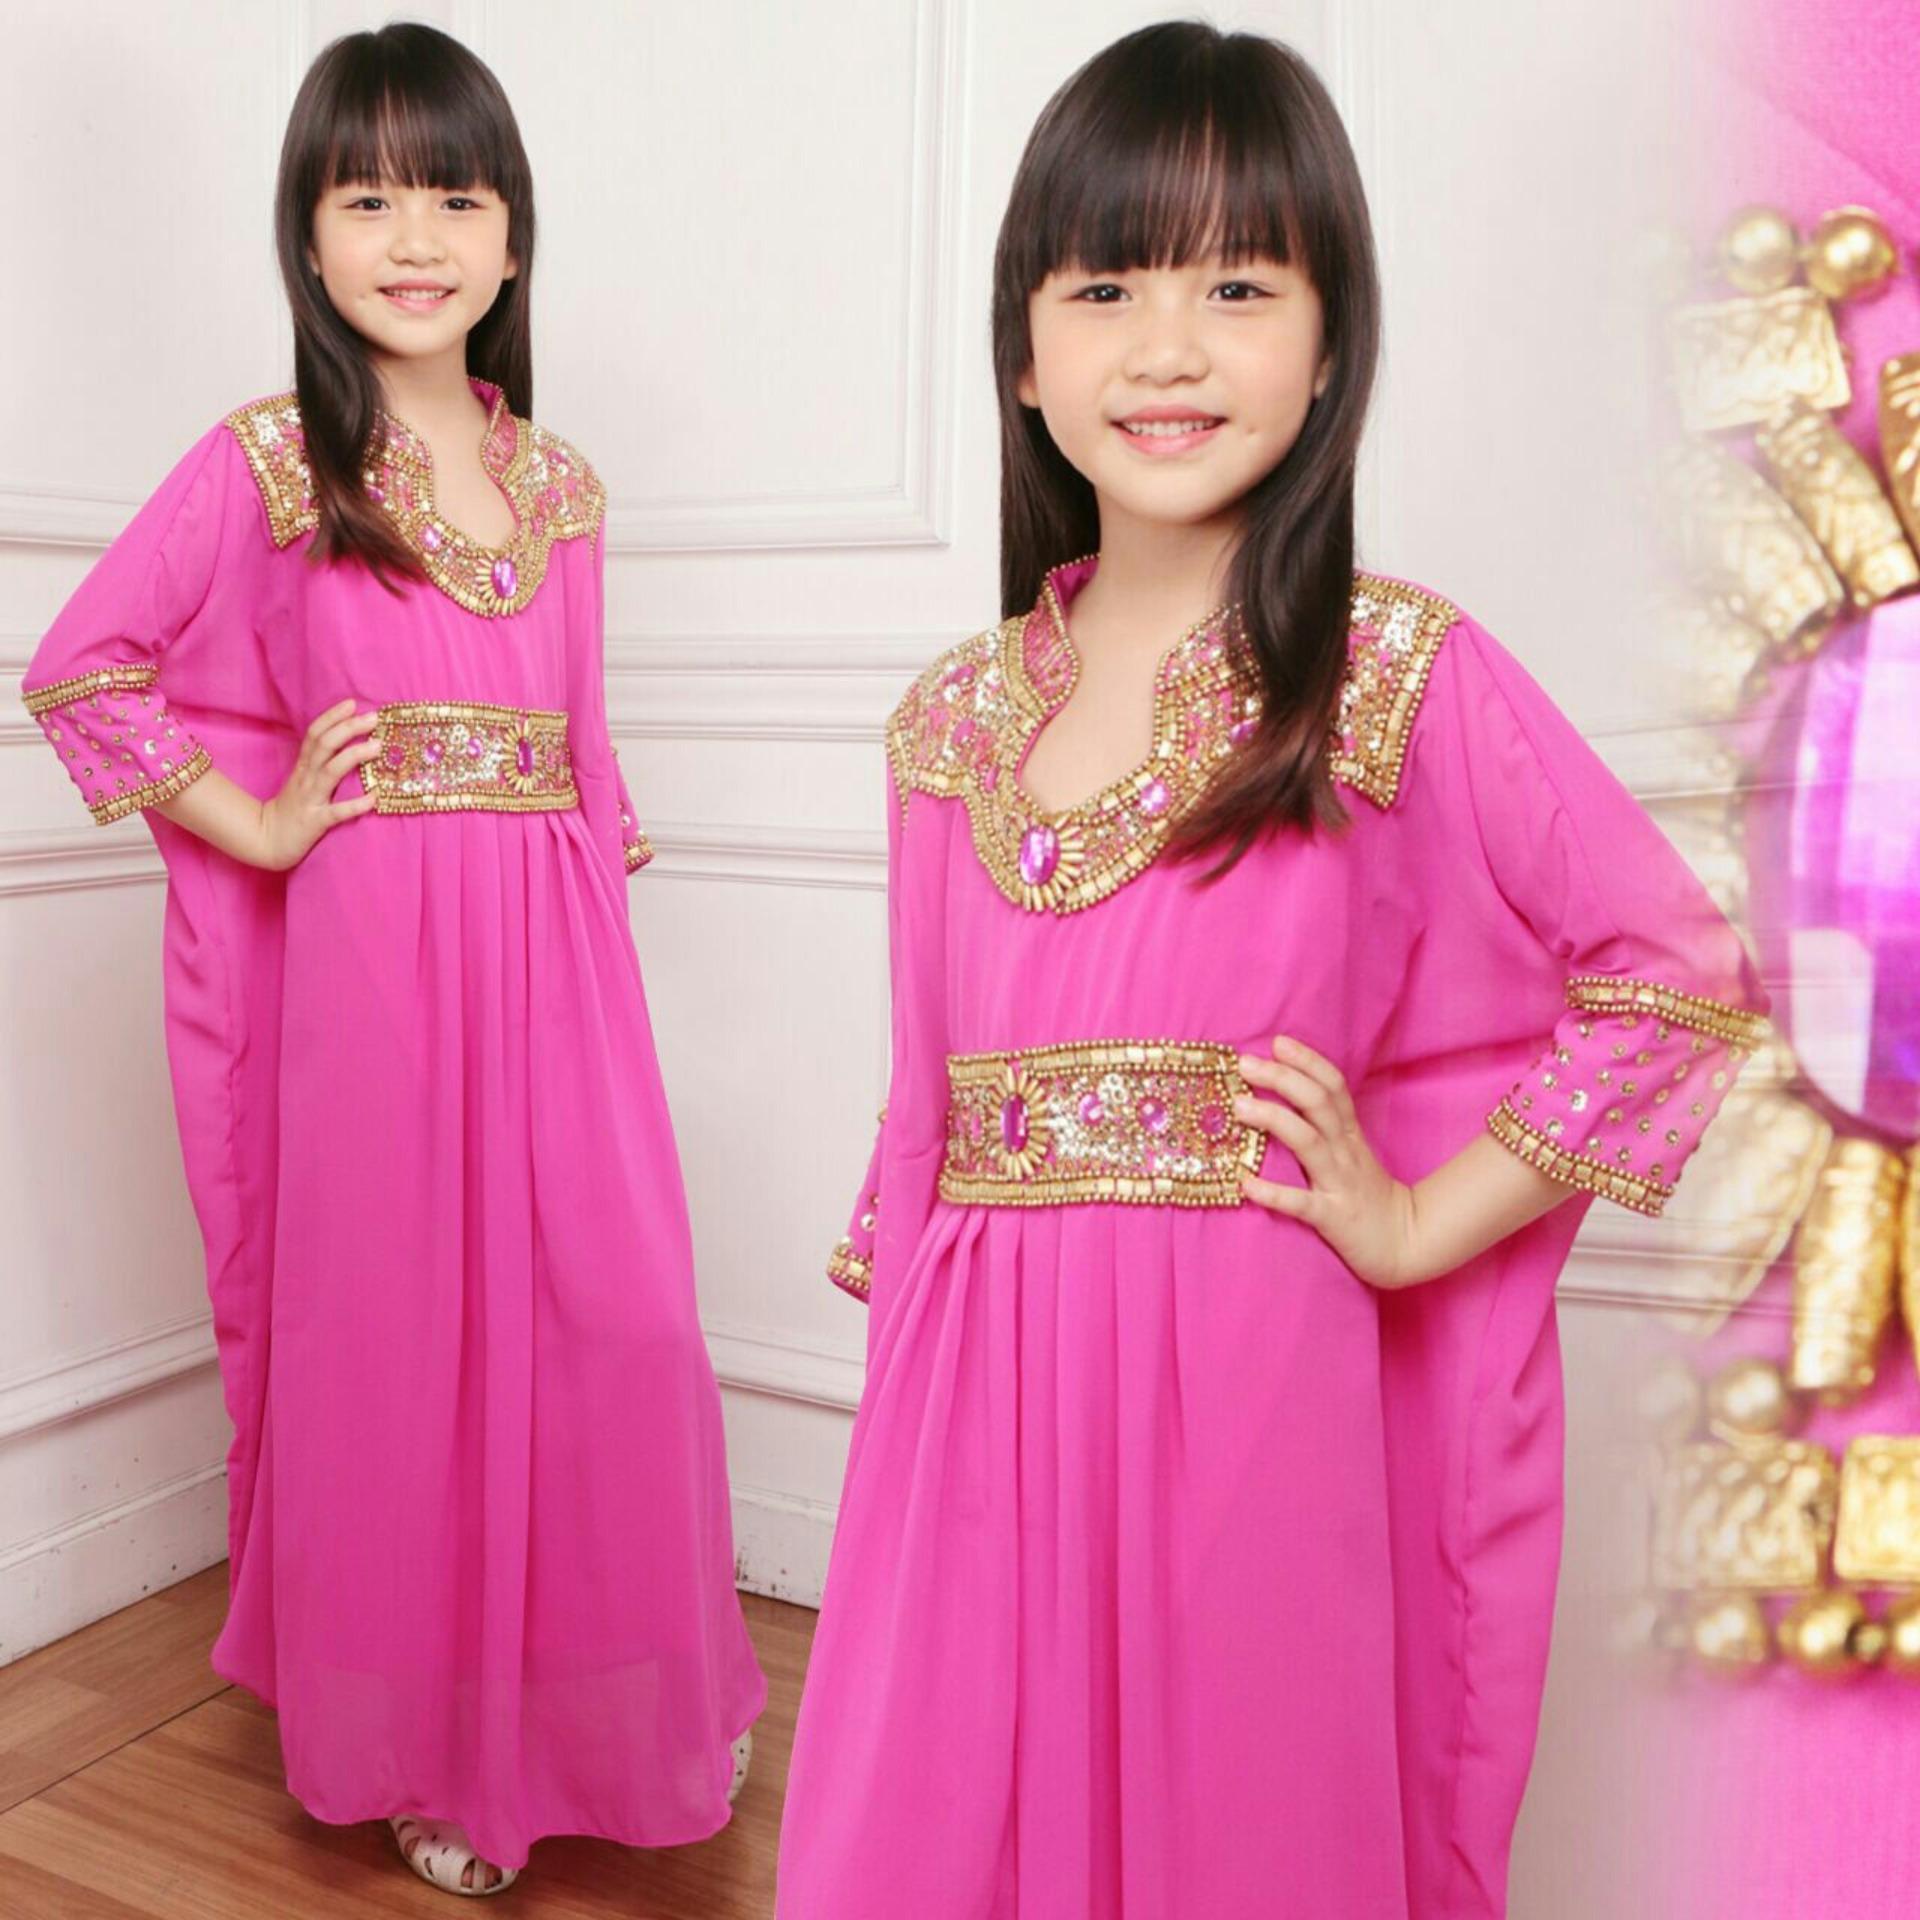 Anami Fashion - Pakaian Anak Perempuan Fashionable - Gamis Kids - Kaftan Adriana